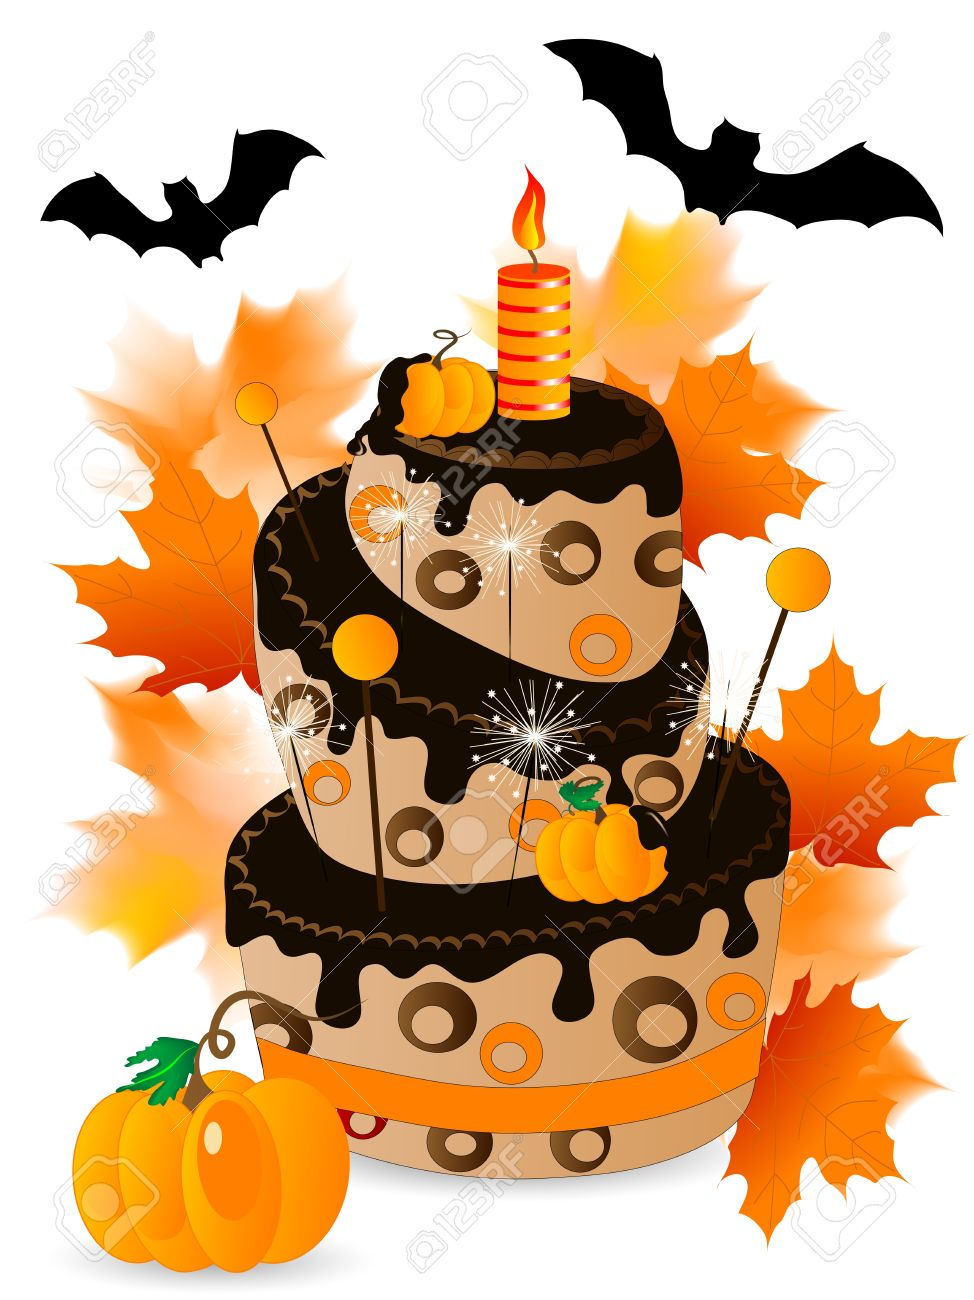 Halloween Cake With Chocolate, .-Halloween cake with chocolate, .-10